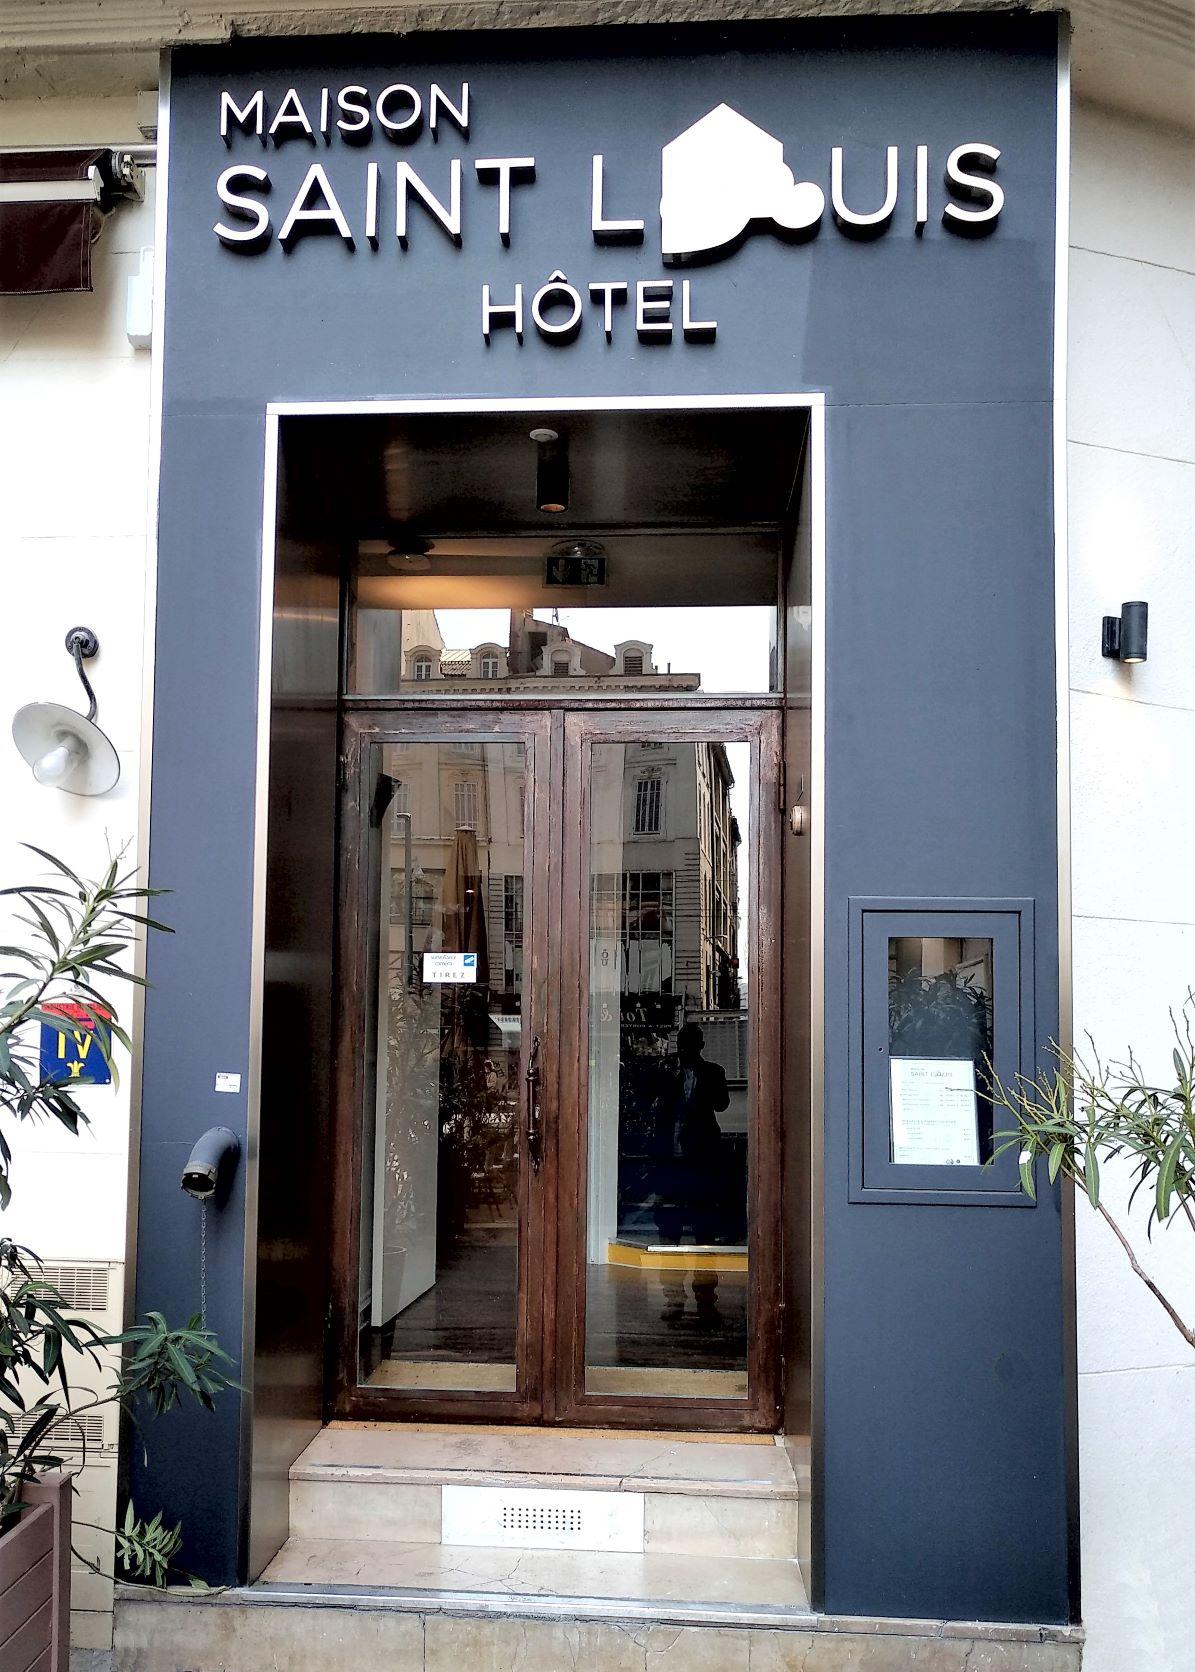 Inox-Ngo-ferronnier-Marseille-habillage-porte-Hotel-Saint-Louis-2R